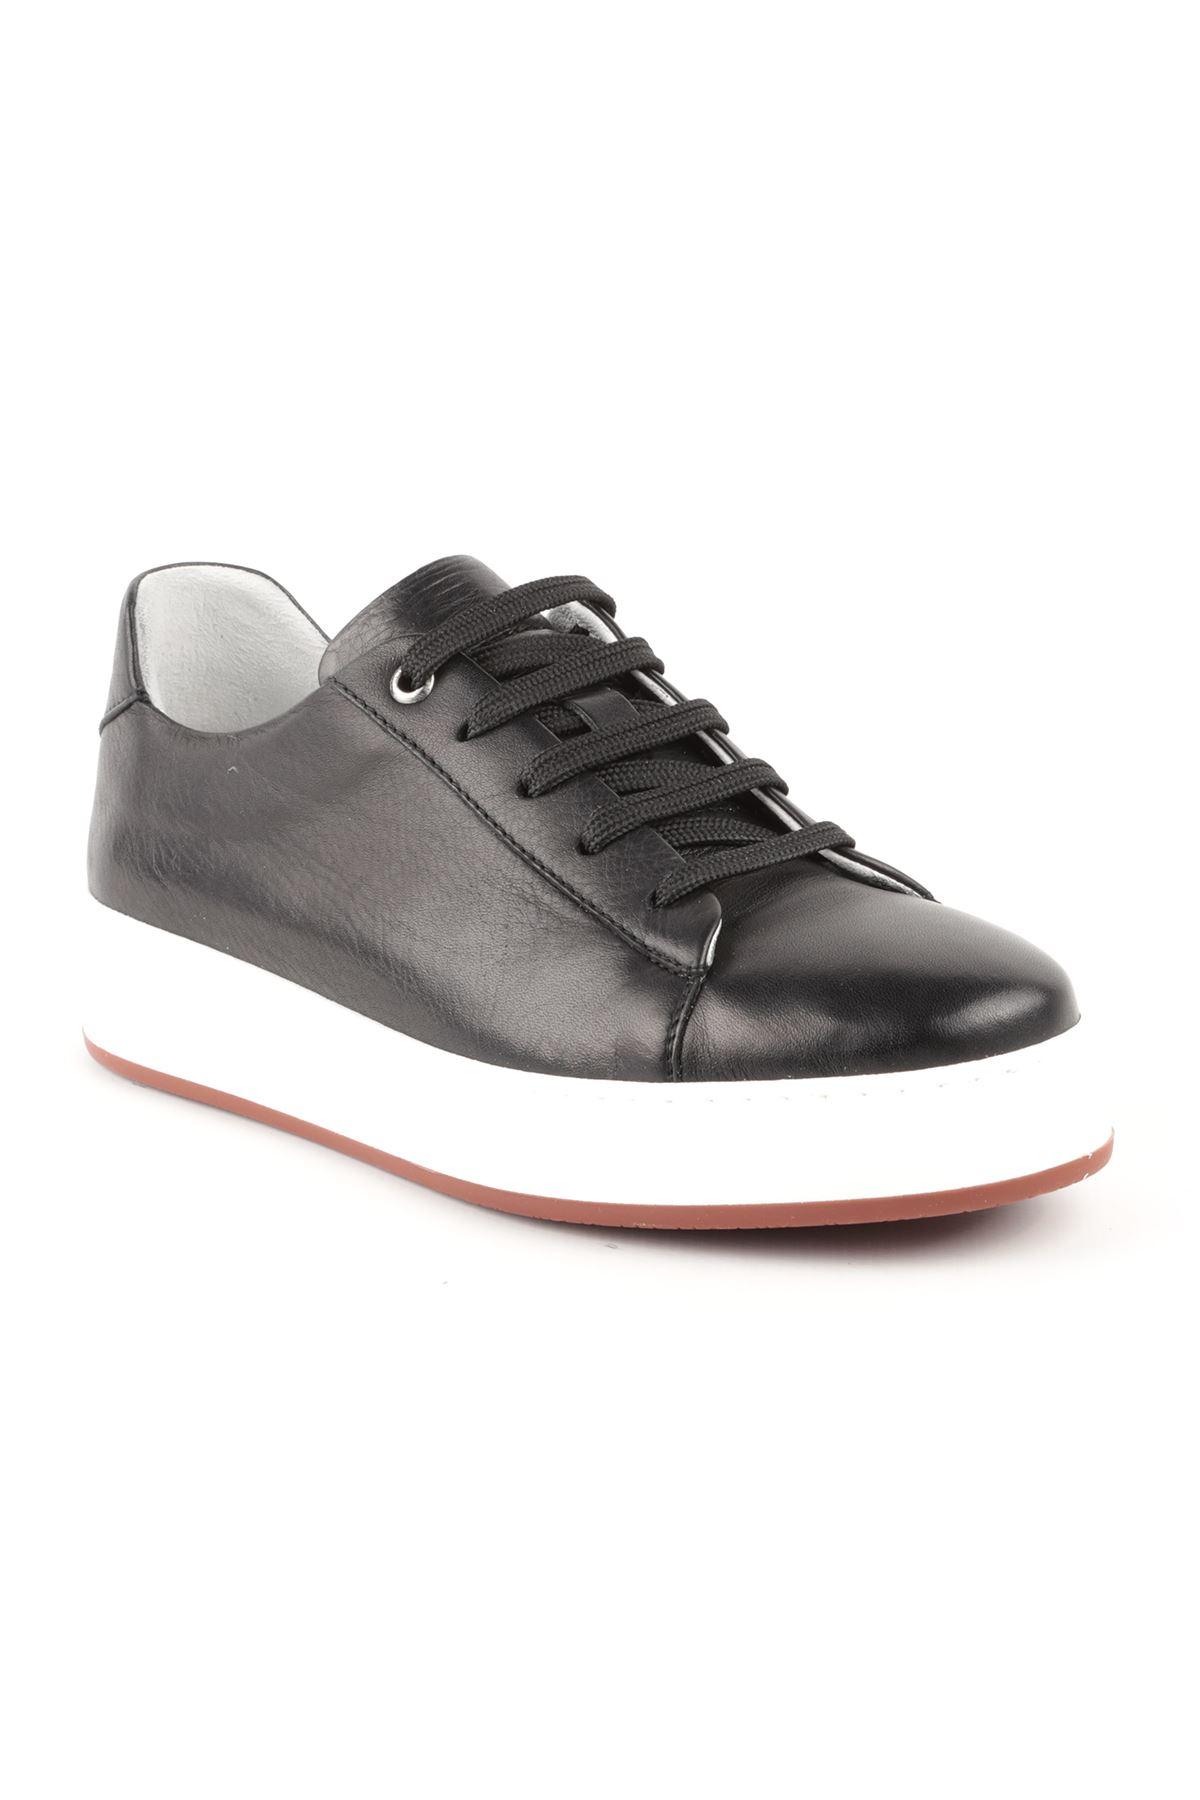 Libero Dİ2026 Siyah Kadın Spor Ayakkabı